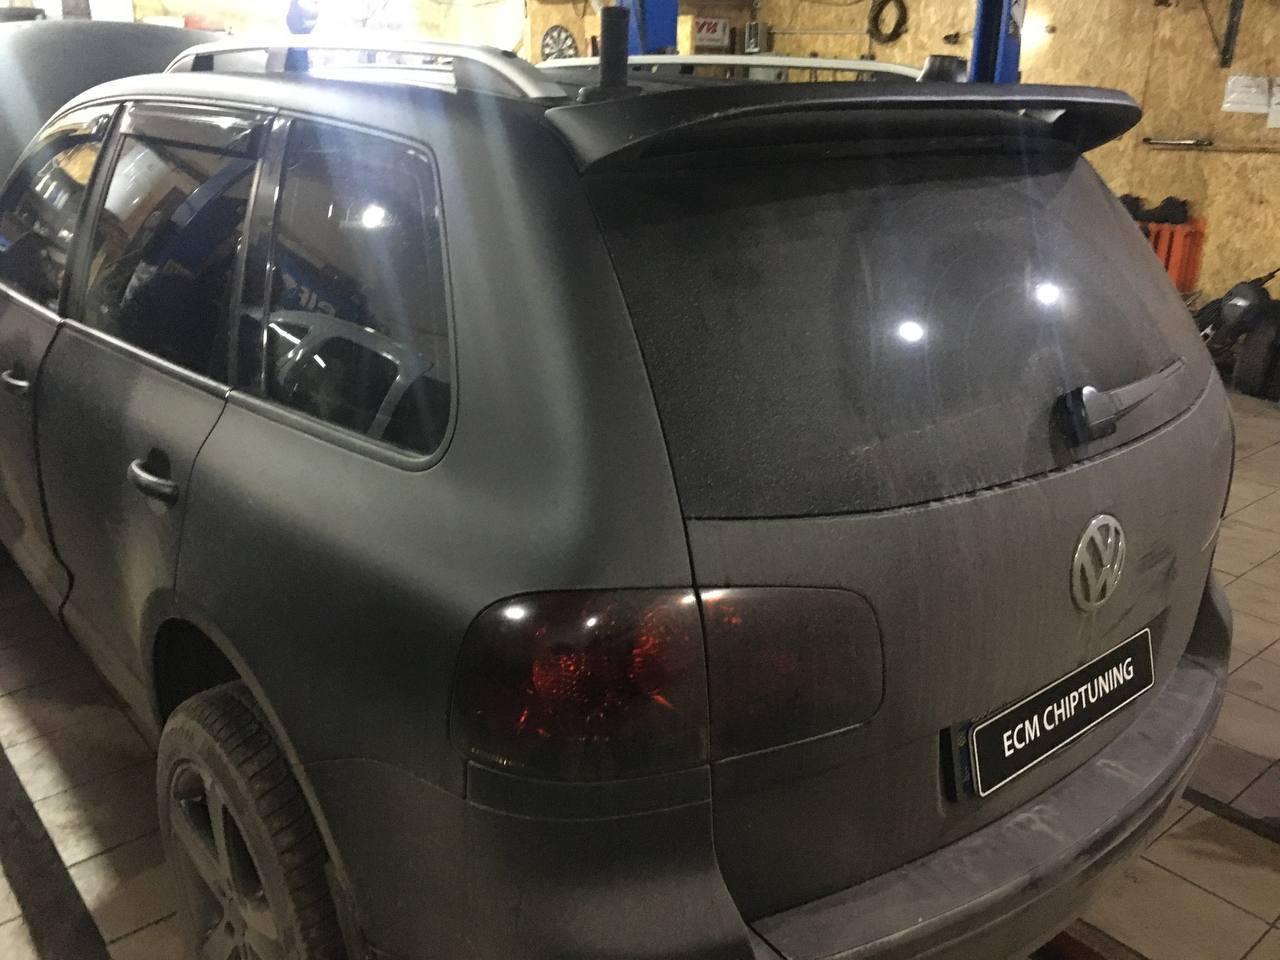 Чип тюнинг Фольксваген (Volkswagen) Touareg 2002 -> 2007 V10 TDI 313 л.с.